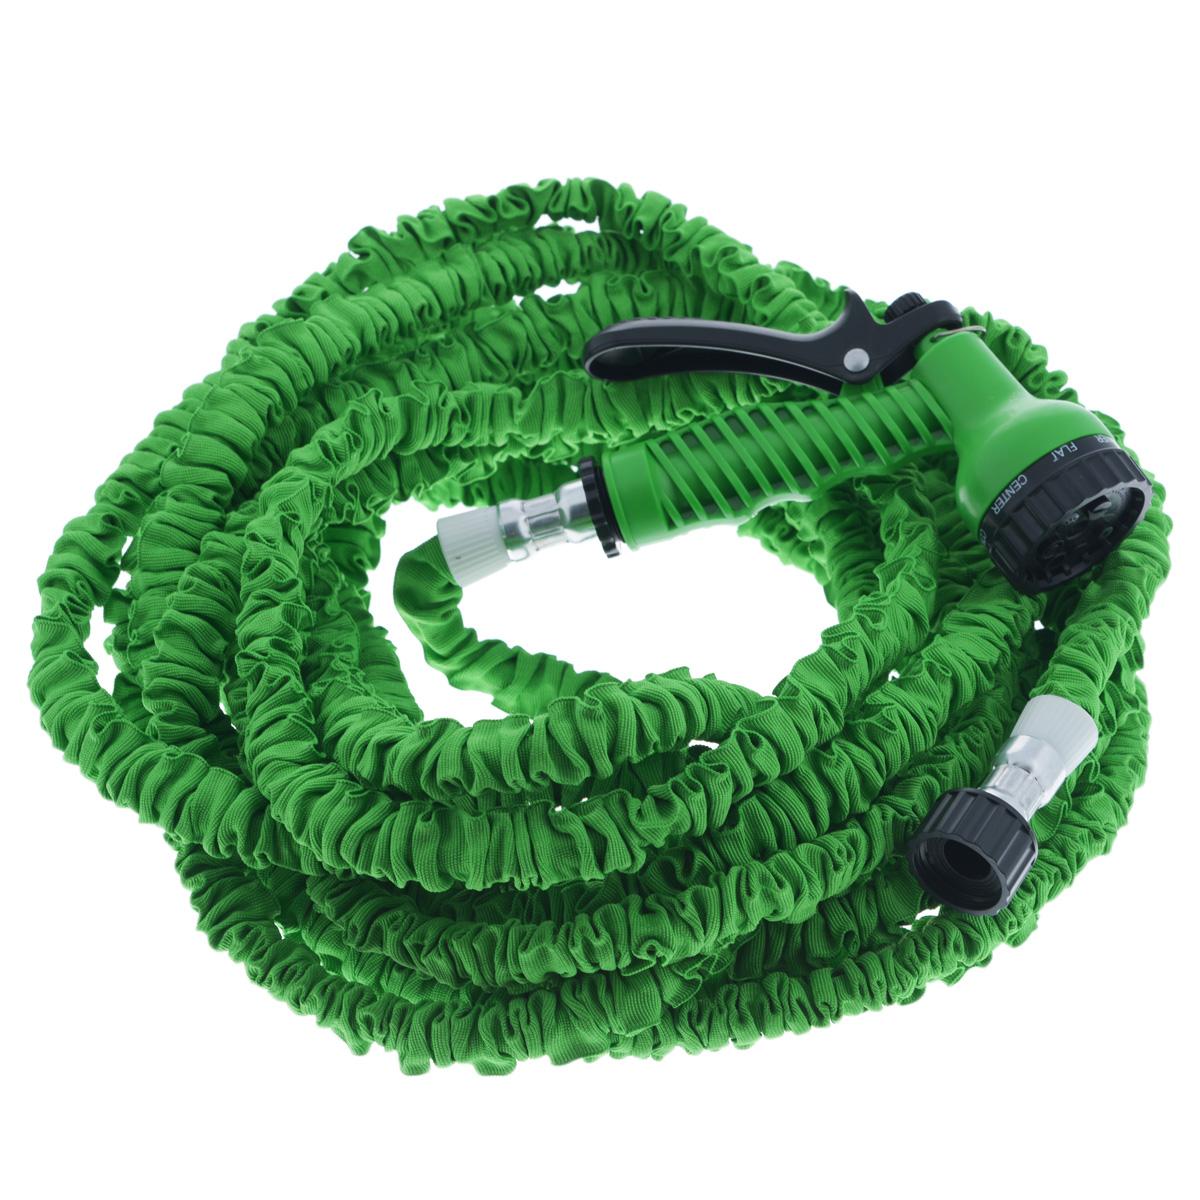 "Шланг садовый ""Mayer & Boch"", цвет: зеленый, 15-45 м"